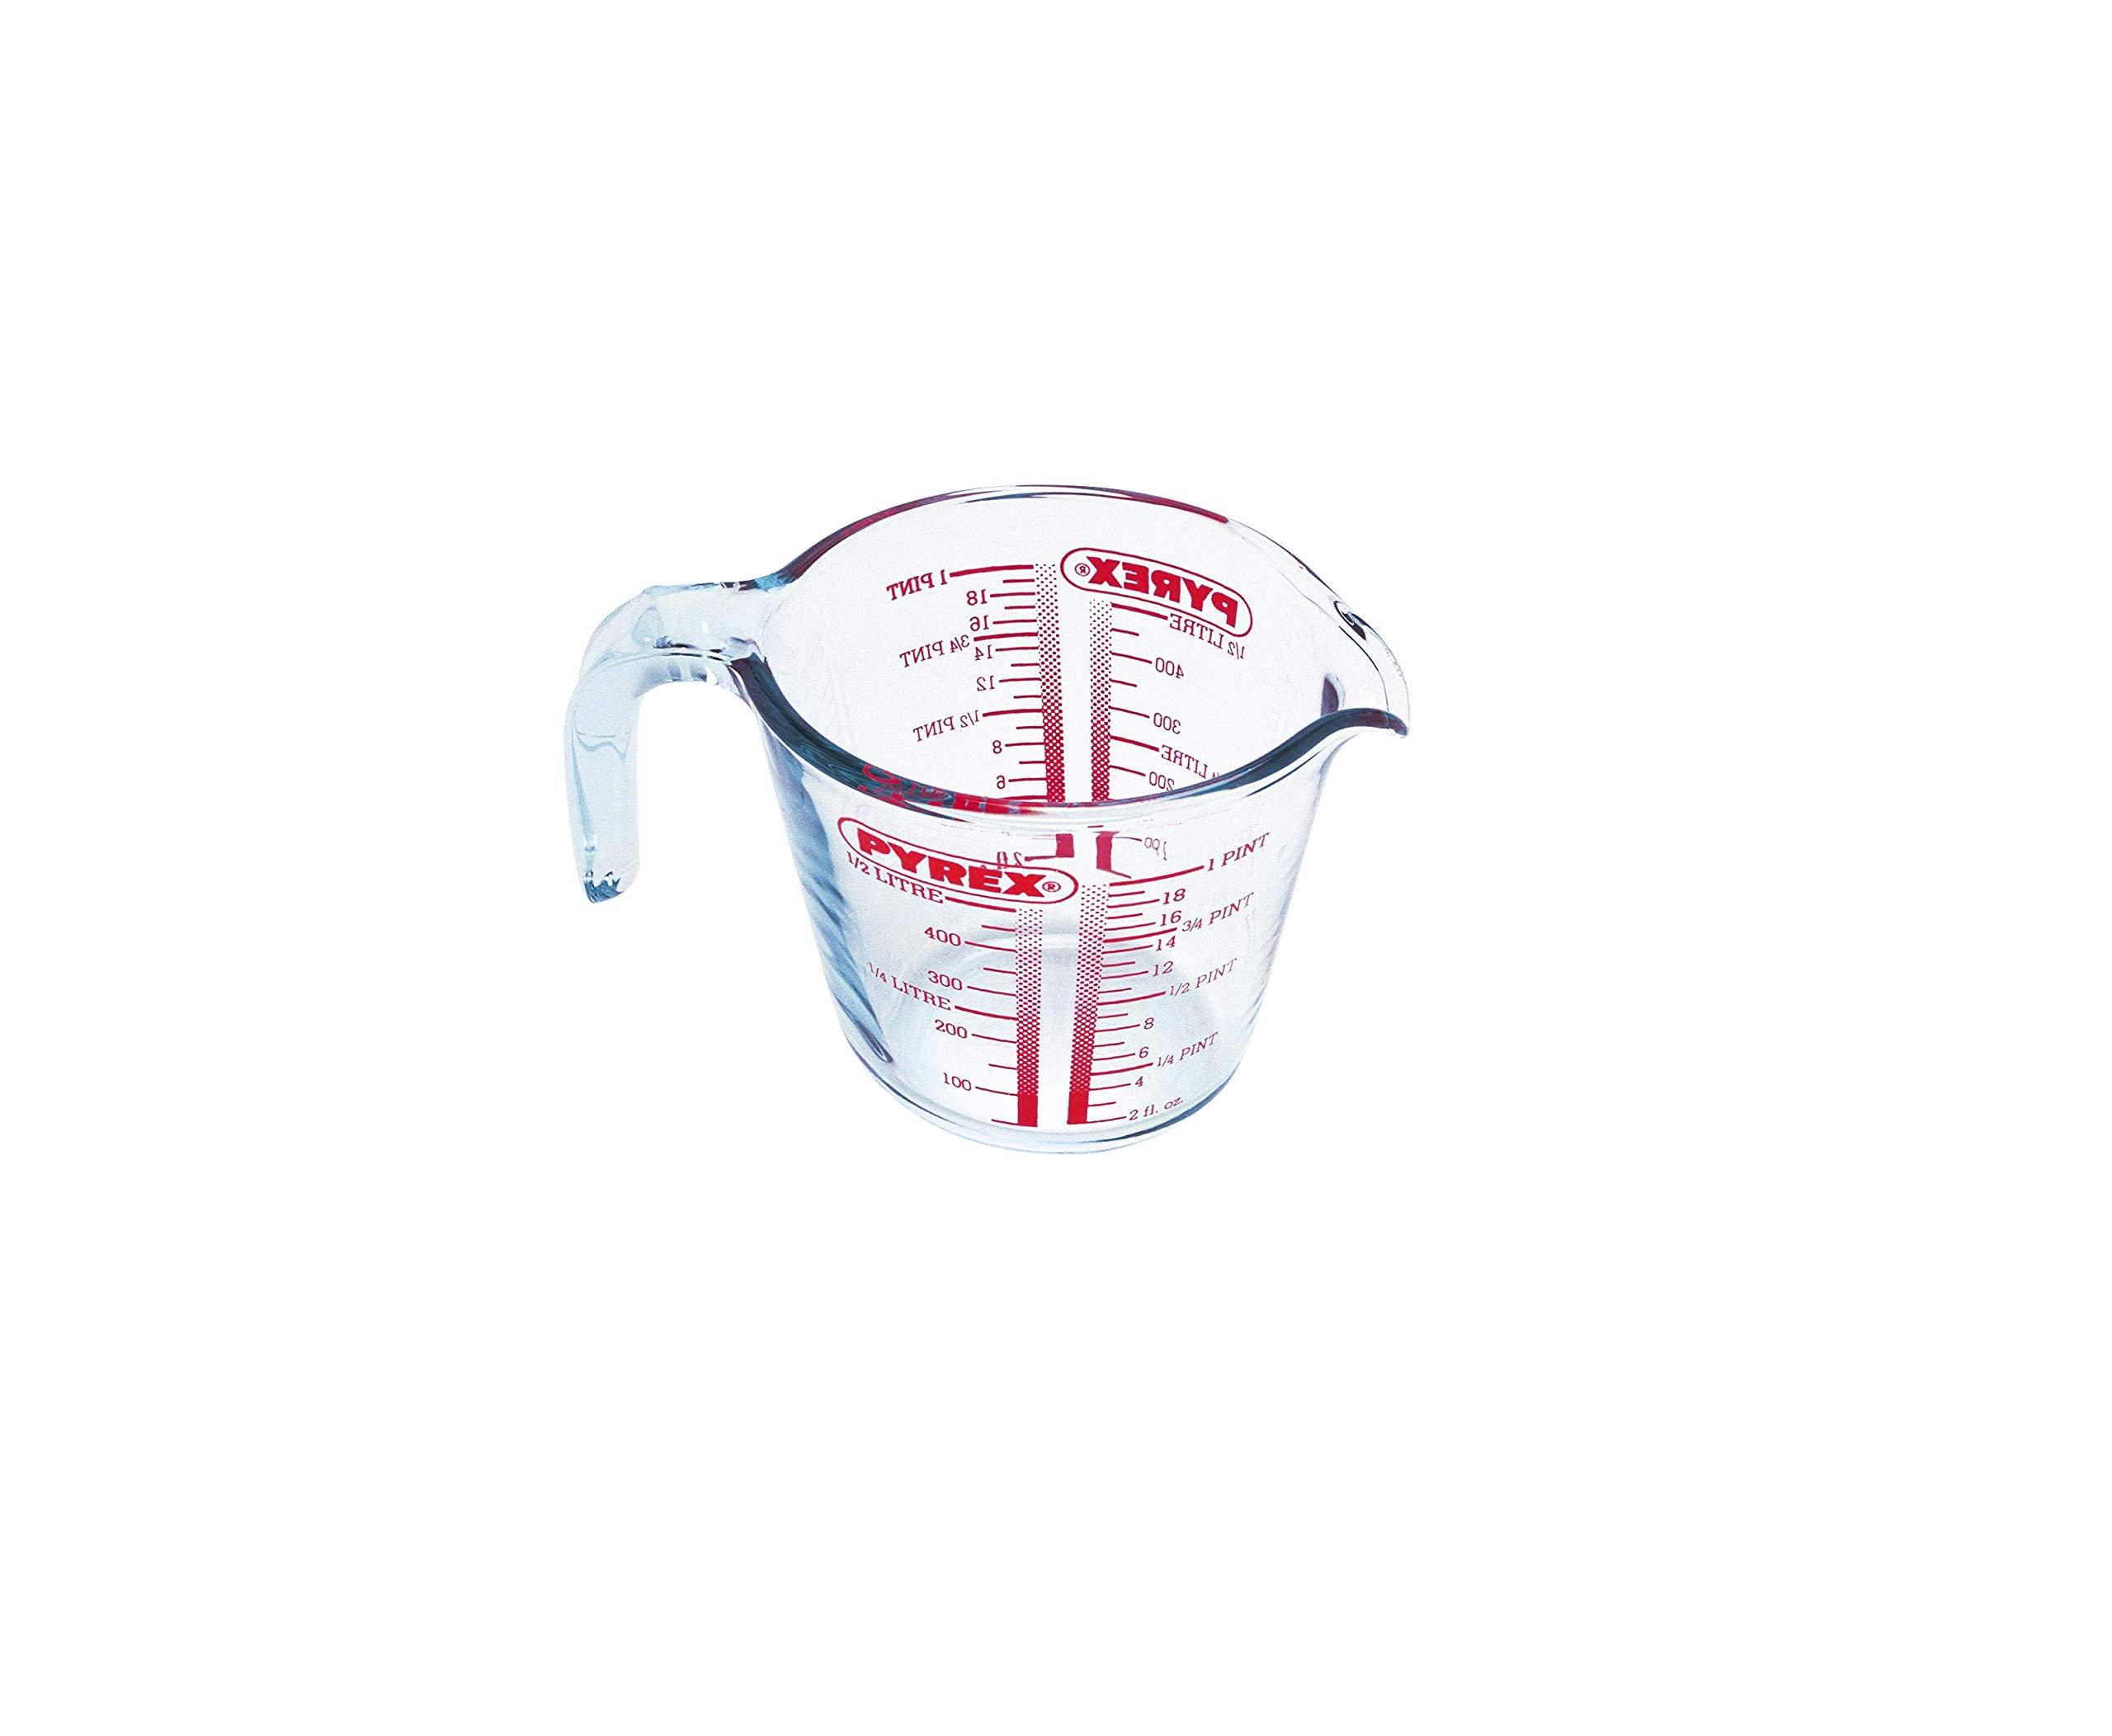 Pyrex Classic Vidrio - Jarra medidora, 0,5 l product image